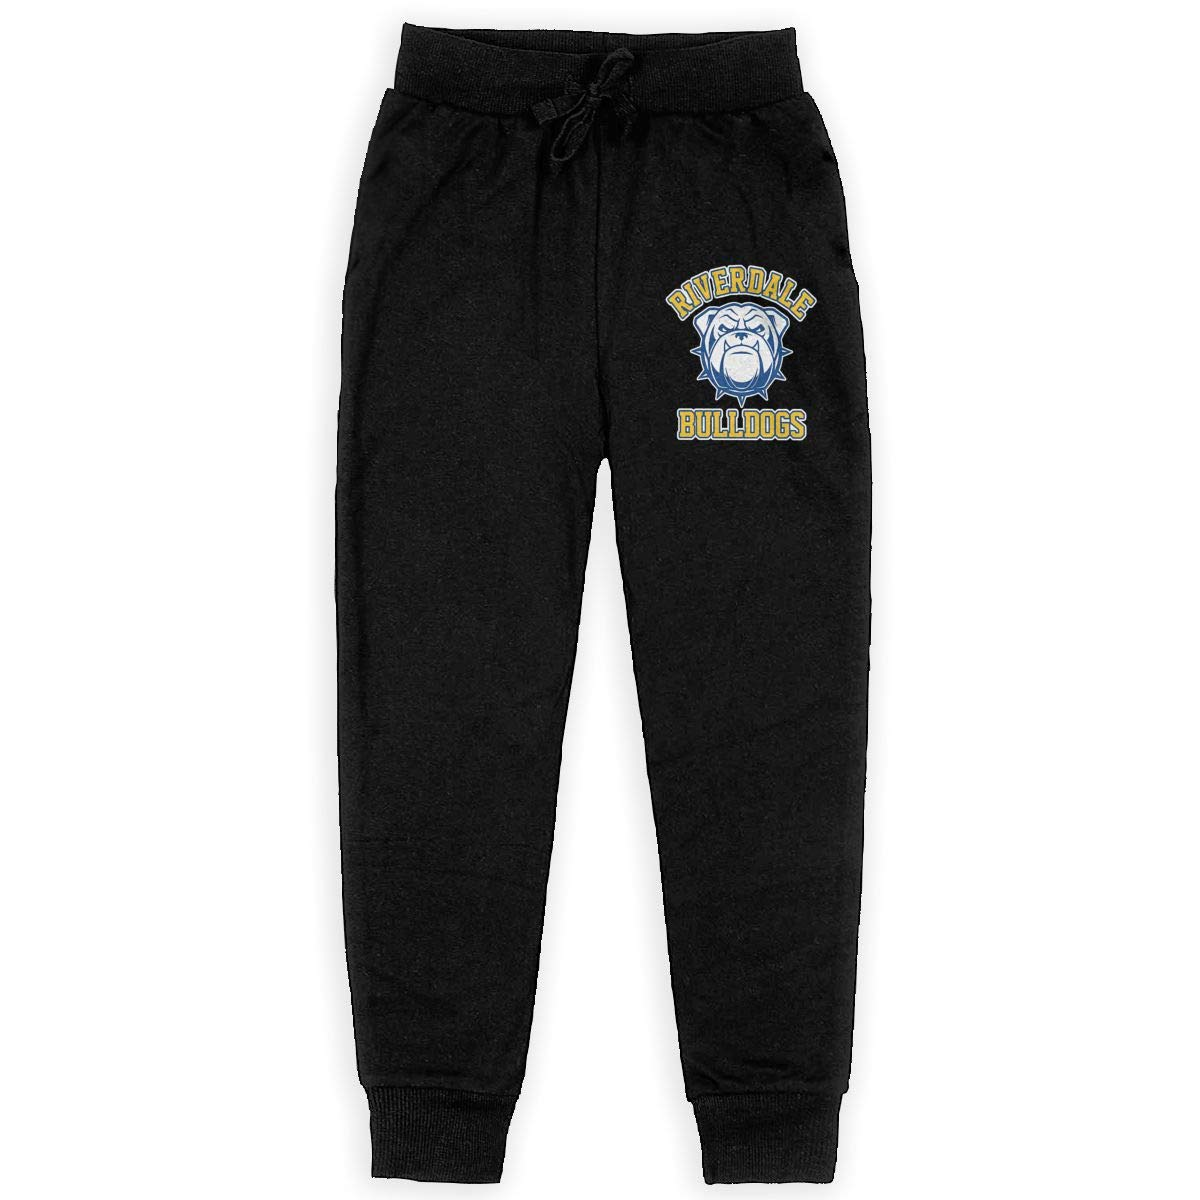 Kim Mittelstaedt Riverdale Bulldogs Boys Big Active Basic Casual Pants Sweatpants for Boys Black